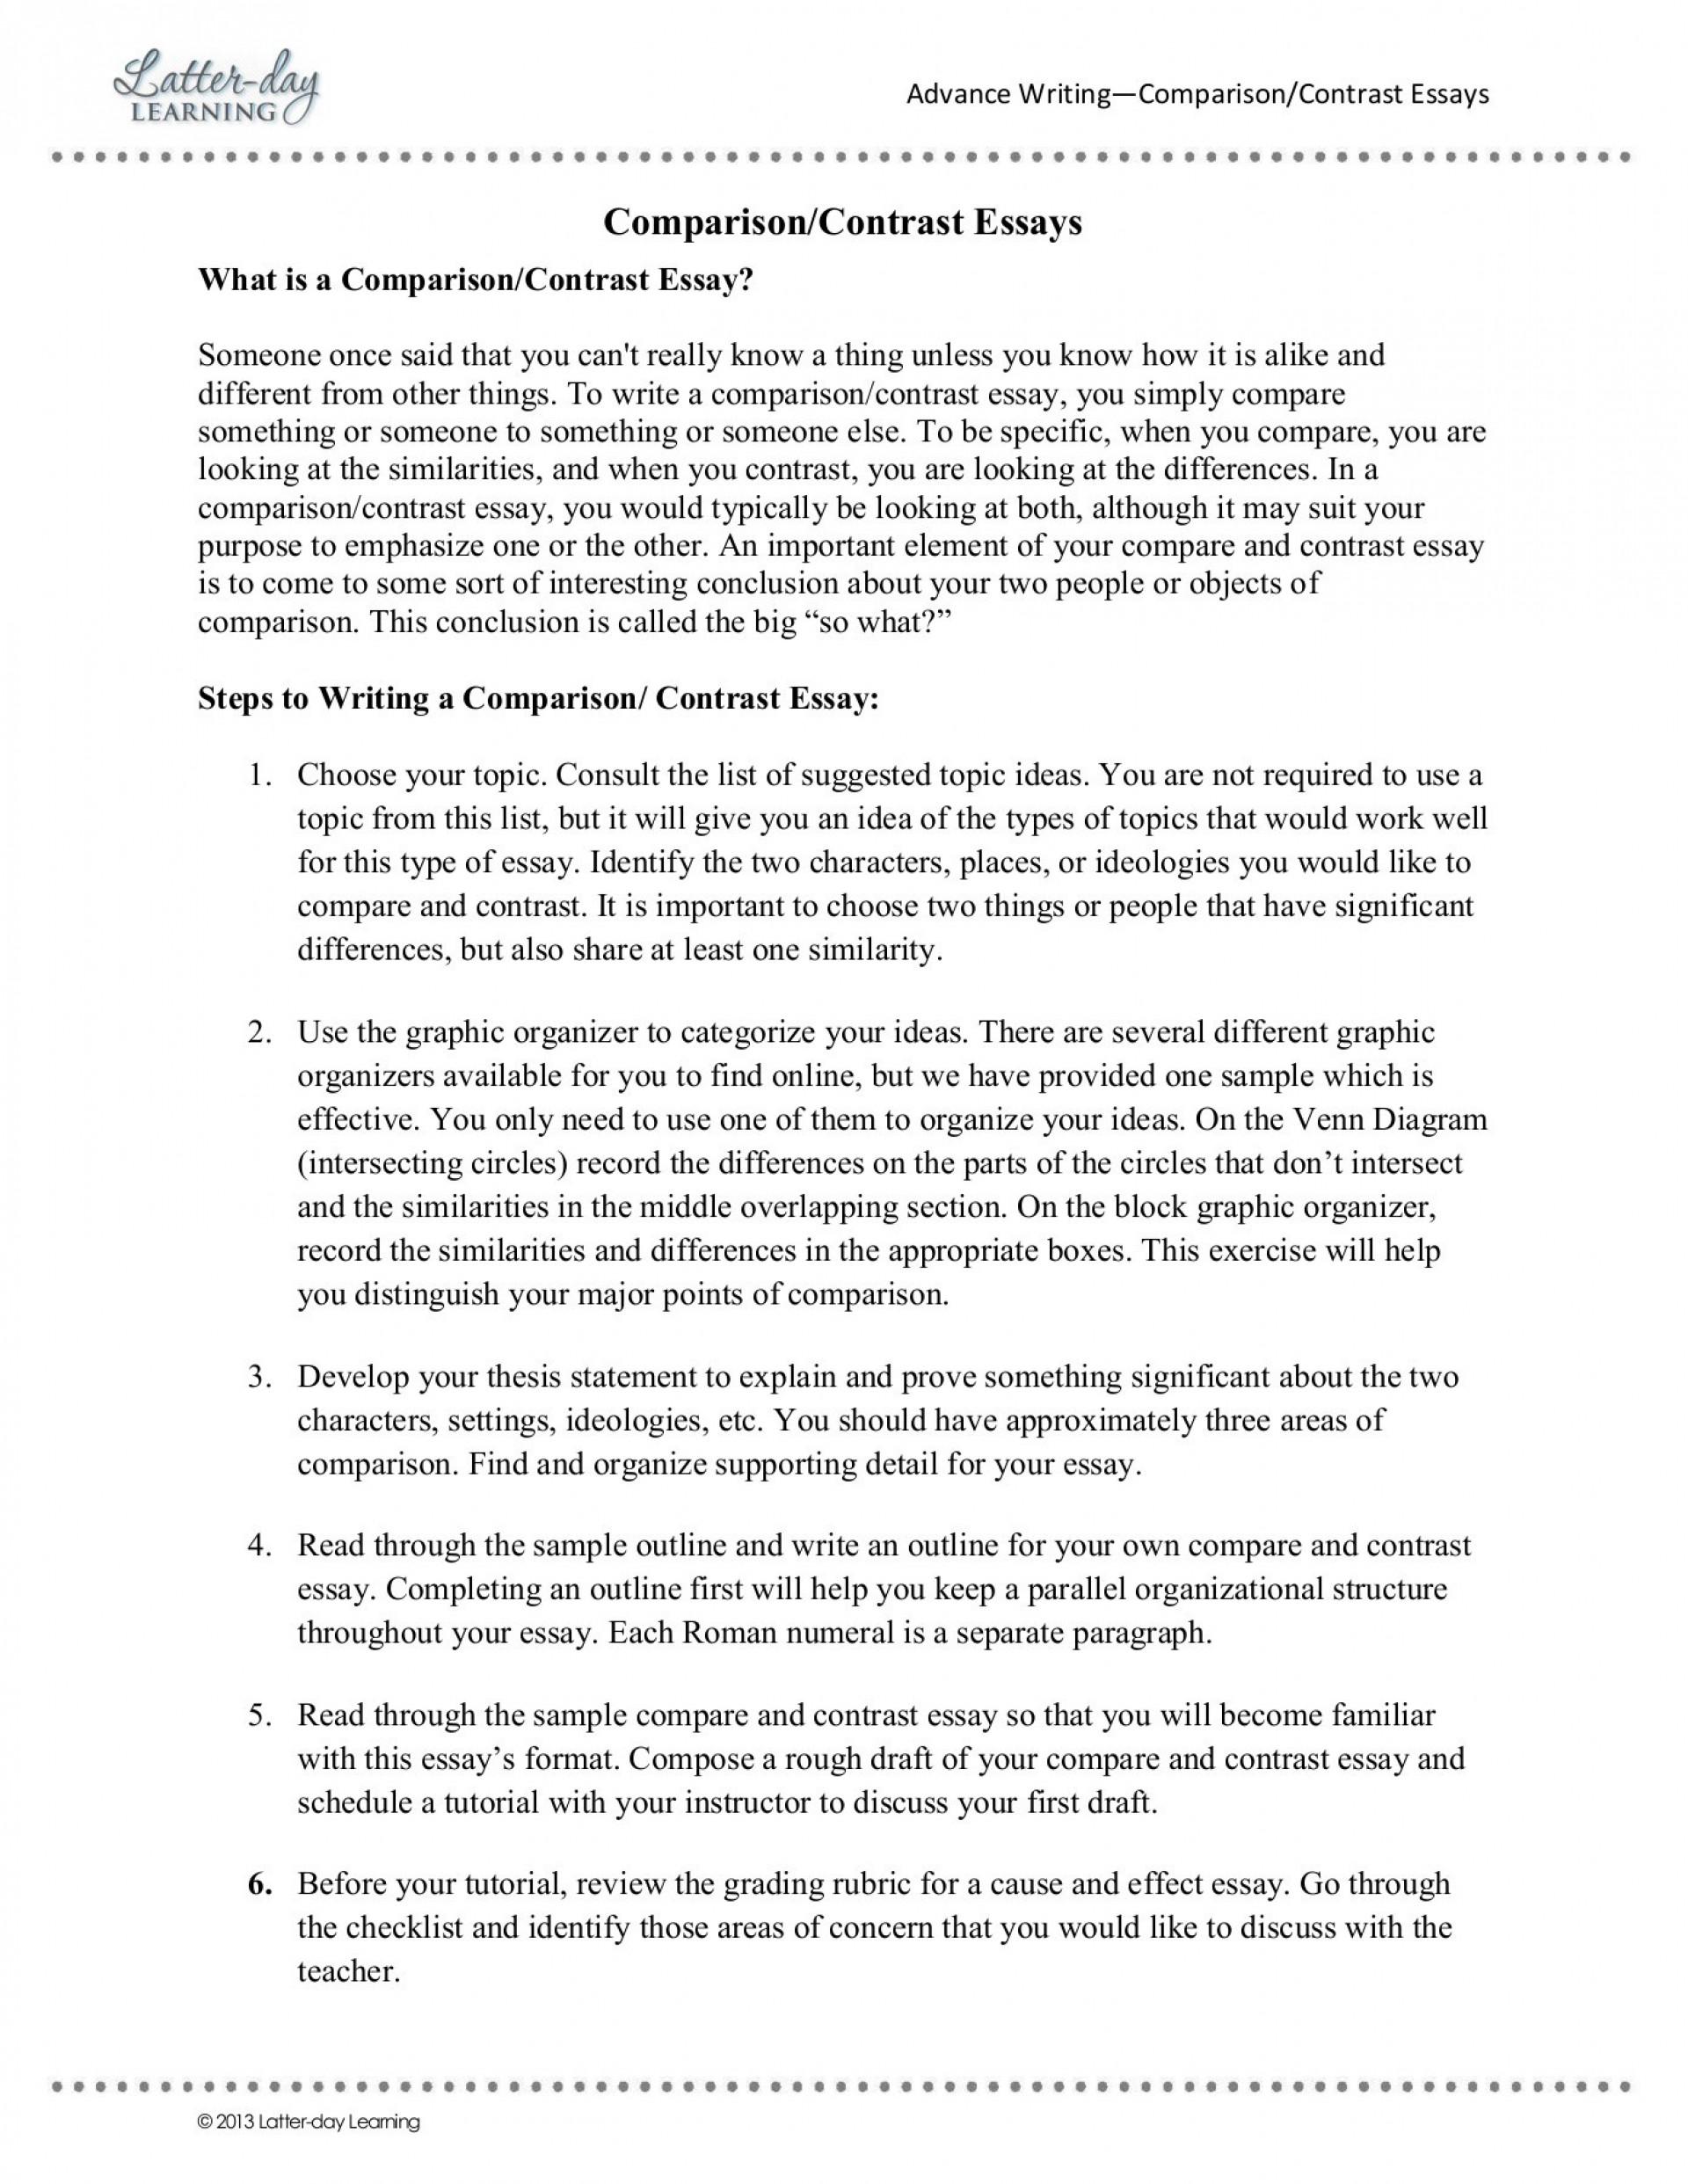 Personal mount rushmore essay